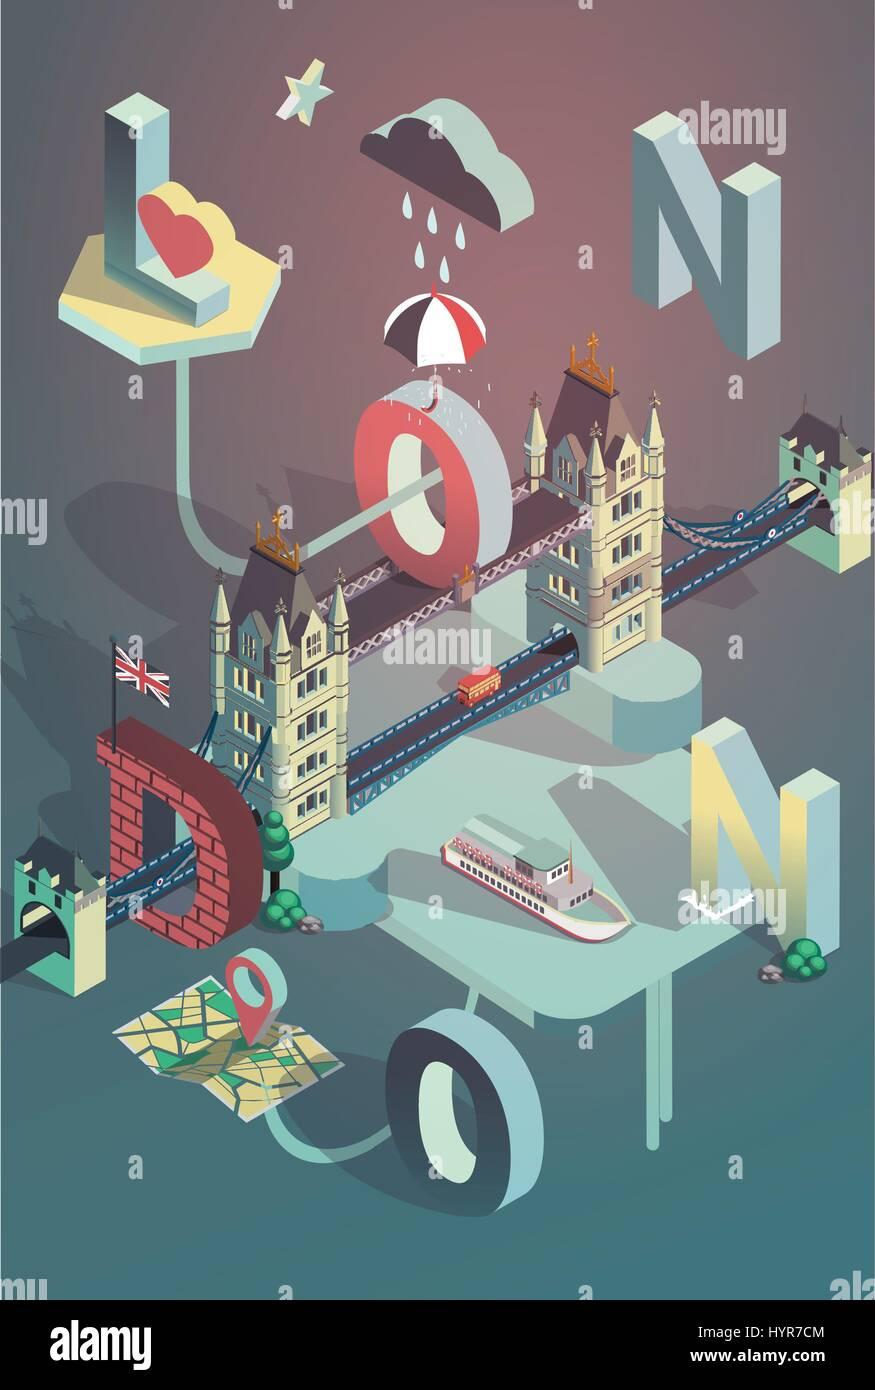 Poster design 3d - 3d Isometric Vector London City Poster Design